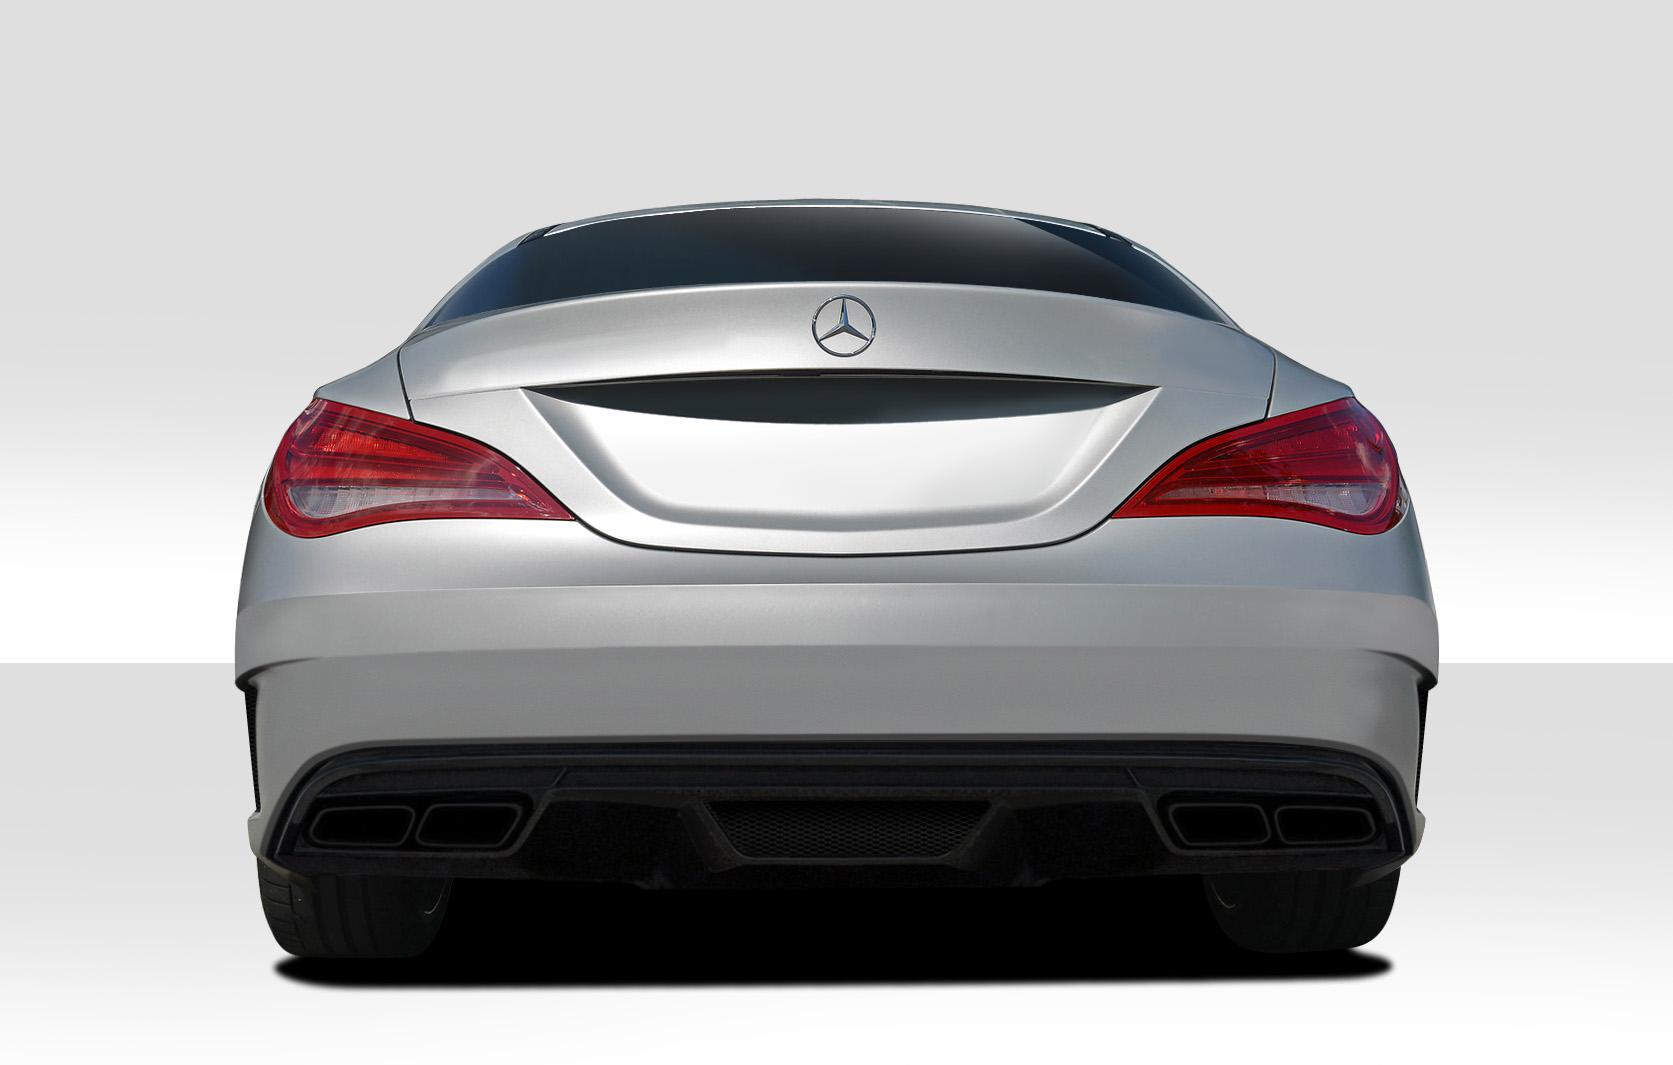 2014-2015 Mercedes CLA Class Duraflex Black Series Look Rear Bumper Cover - 1 Piece